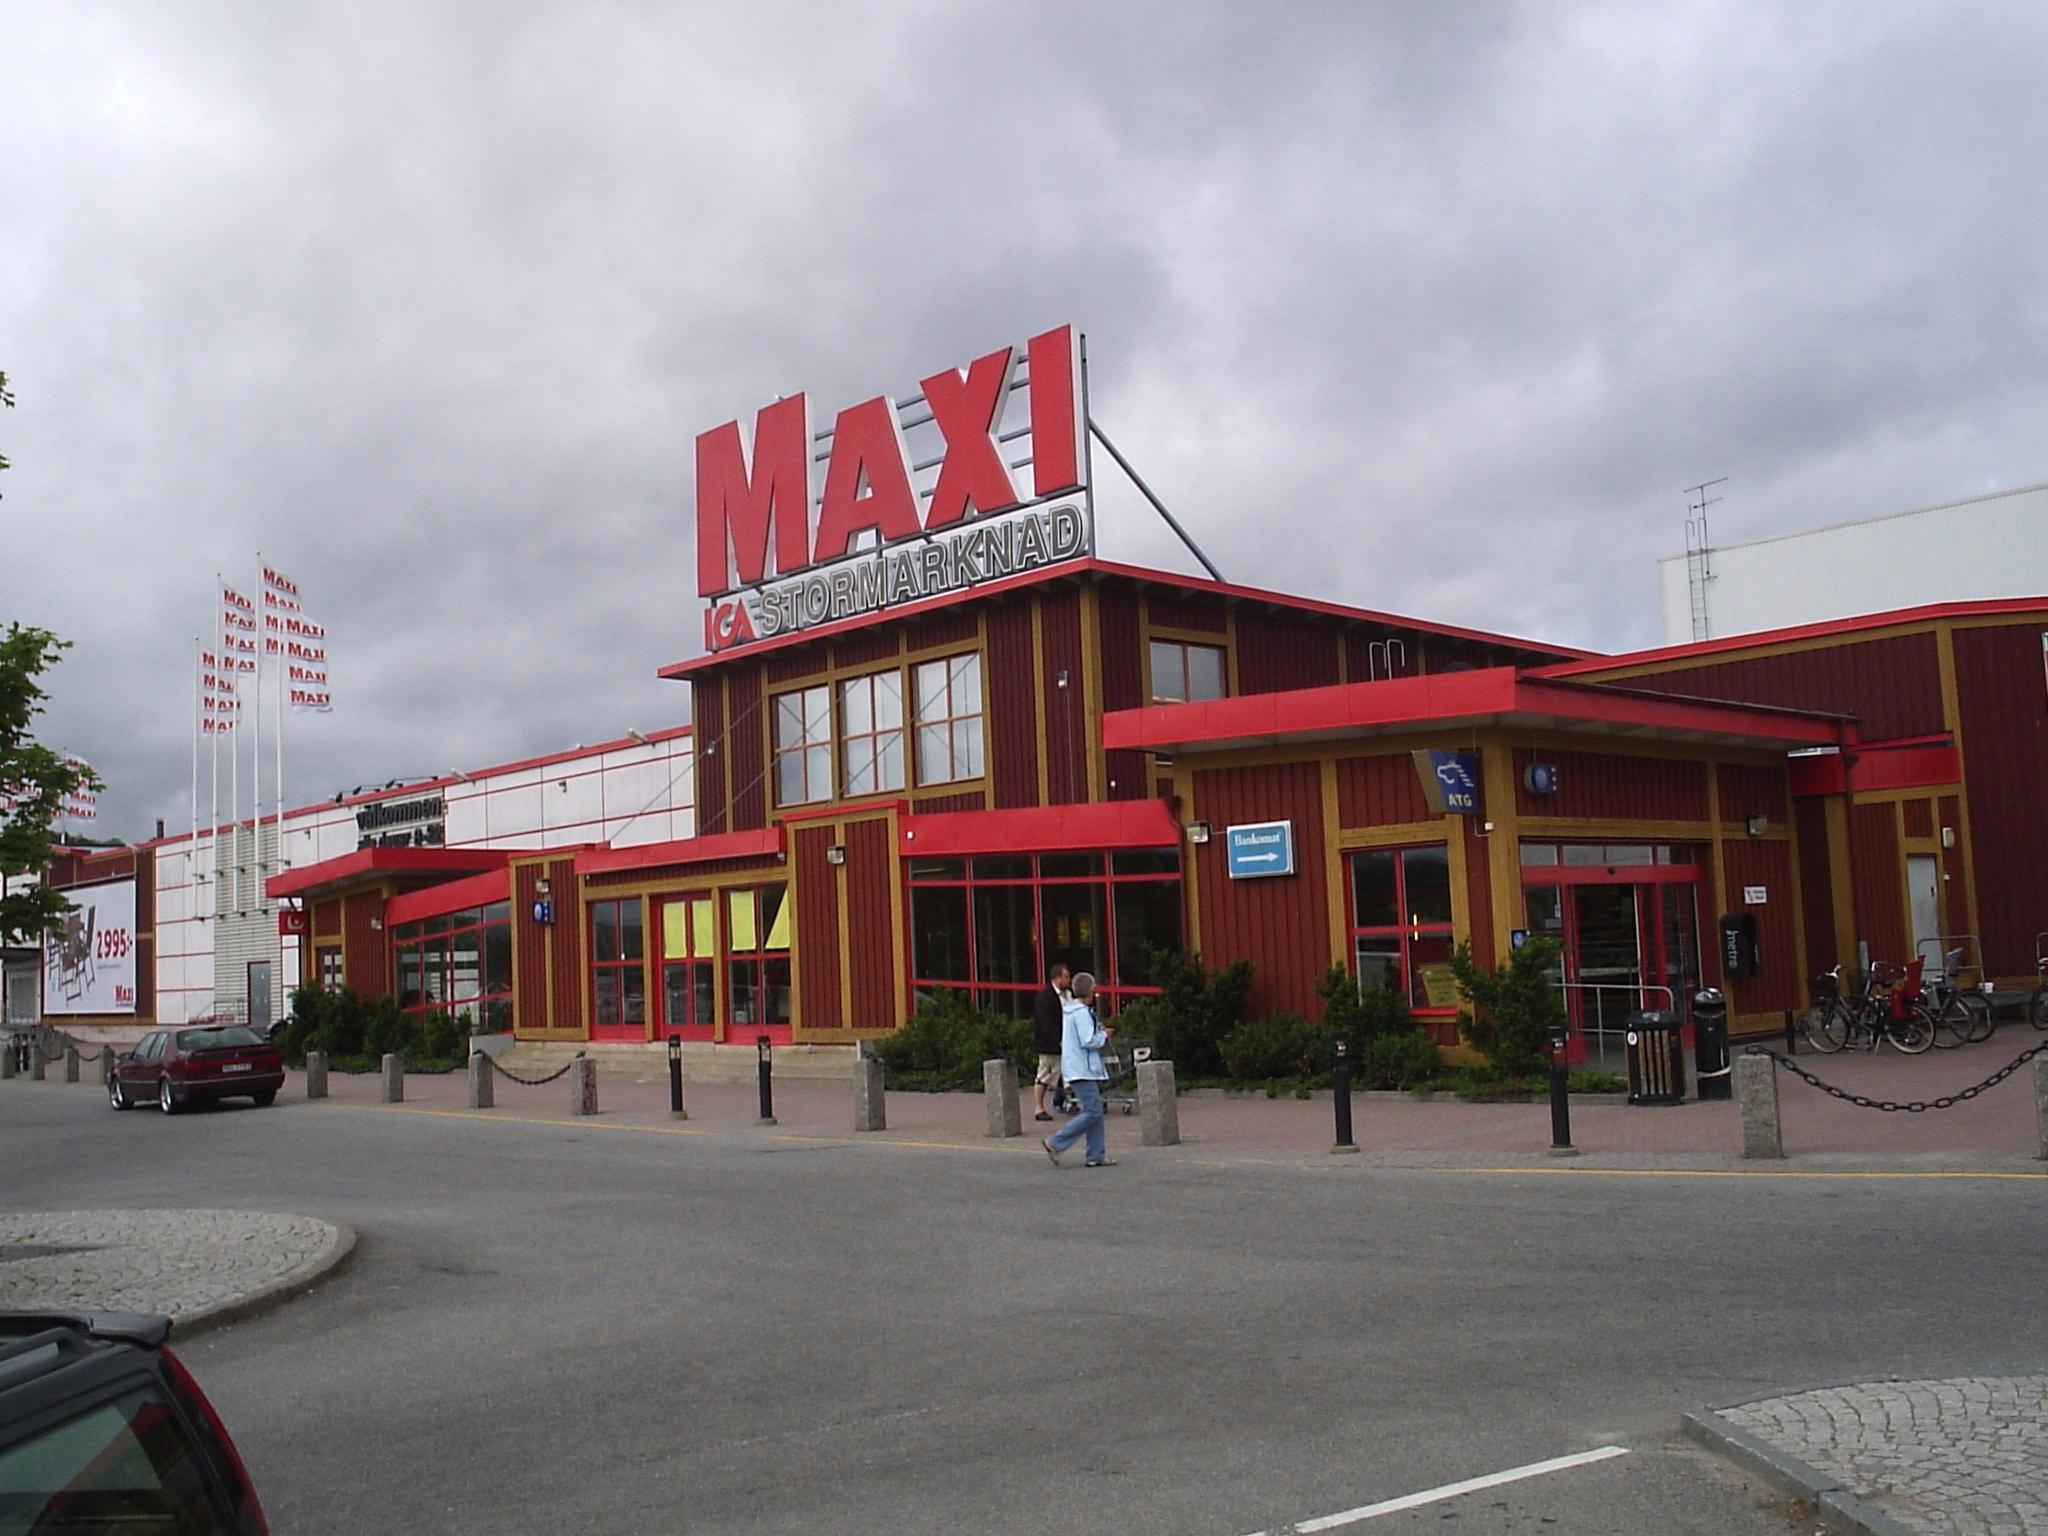 File ICA Maxi i Kungälv, den 27 juni 2006 JPG Wikimedia Commons